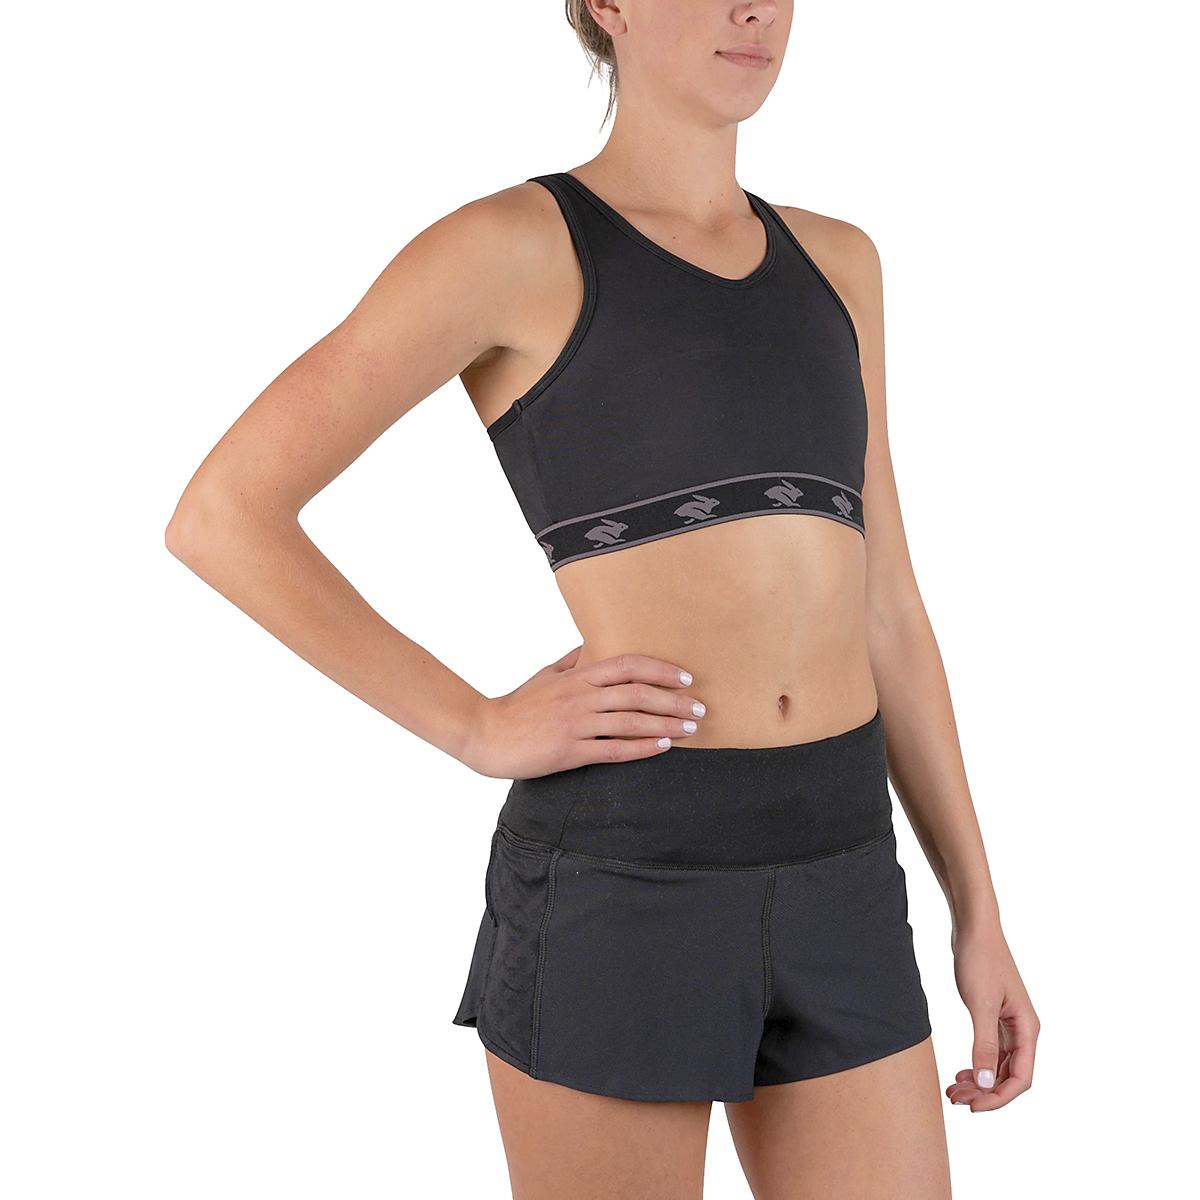 Women's Rabbit UtiliBRA-vo Sports Bra - Color: Black - Size: XS, Black, large, image 3